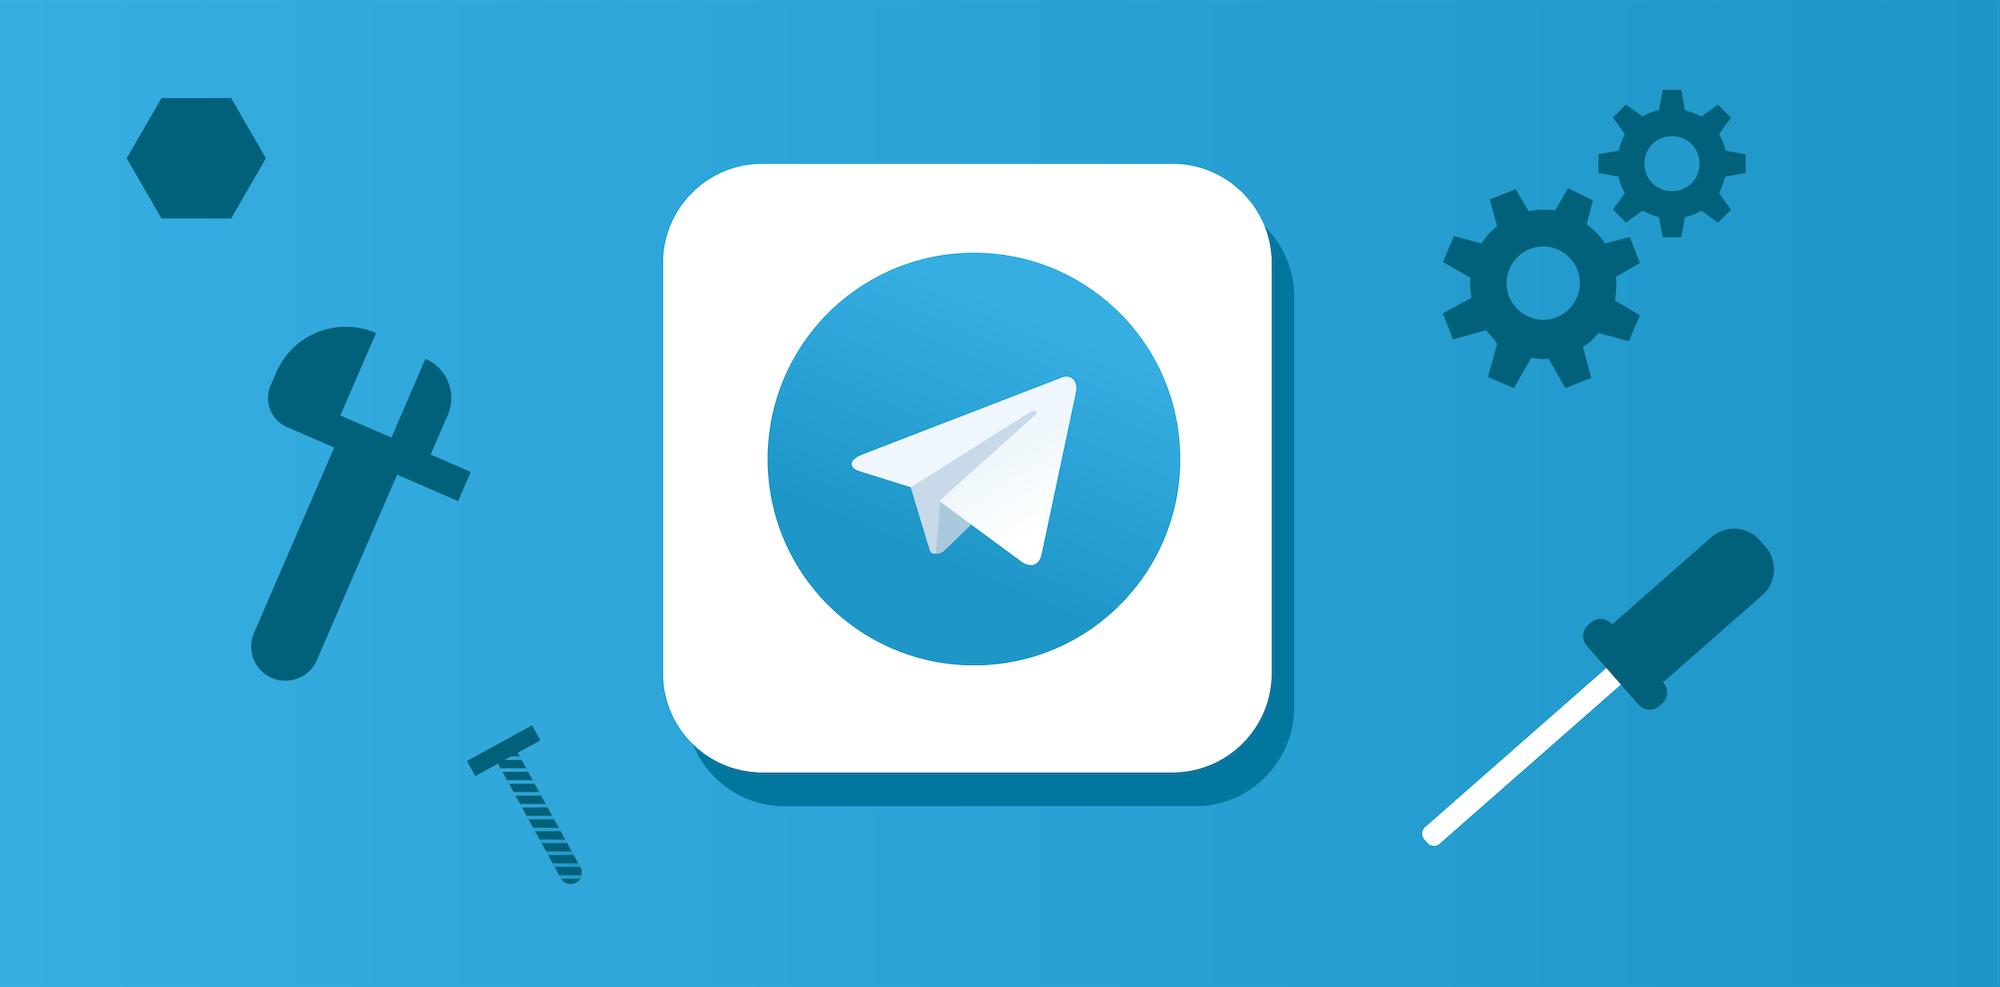 Telegram 创建一个私聊 bot